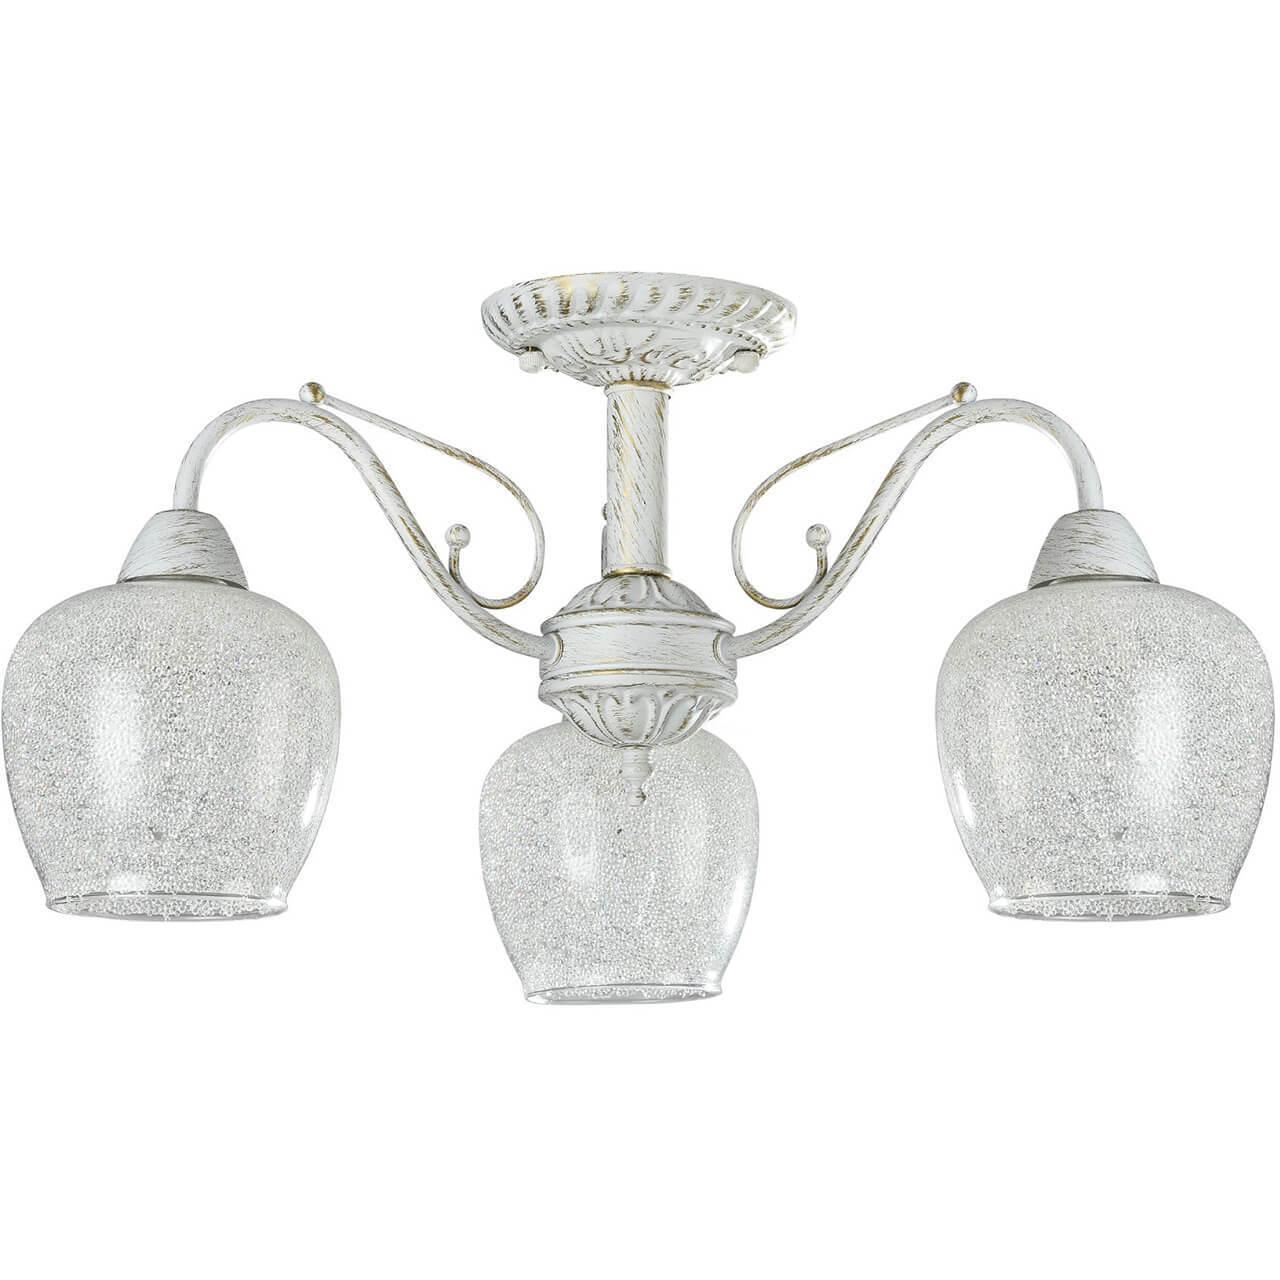 Потолочный светильник Freya FR2751-PL-03-WG, E14, 60 Вт люстра freya freya fr2751 pl 05 wg